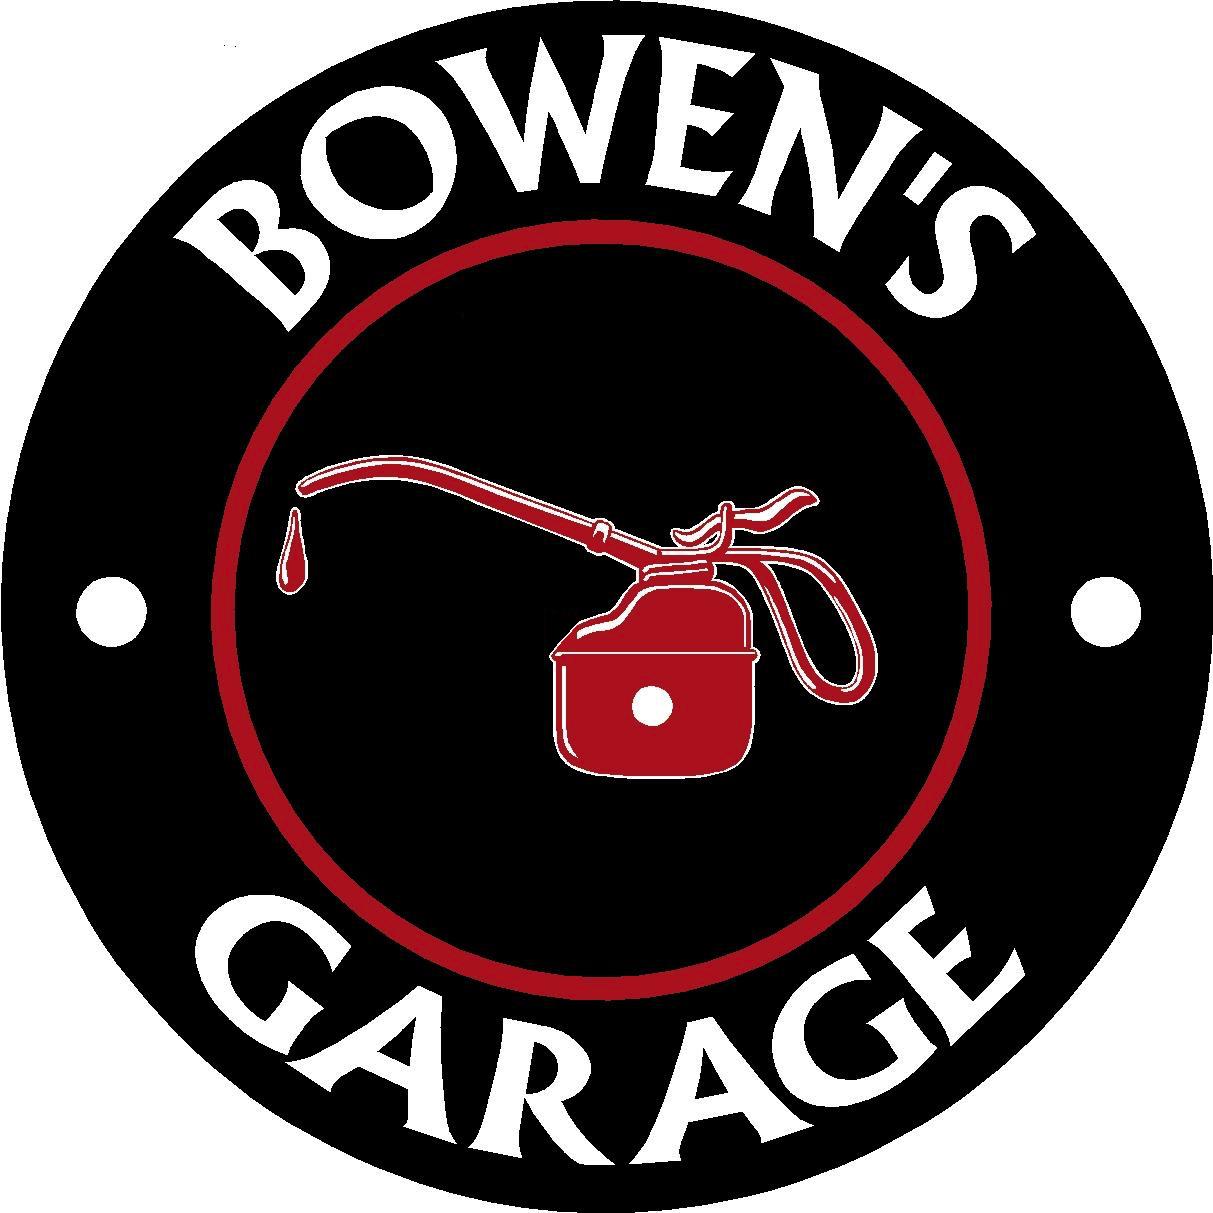 Bowen's Garage Logo